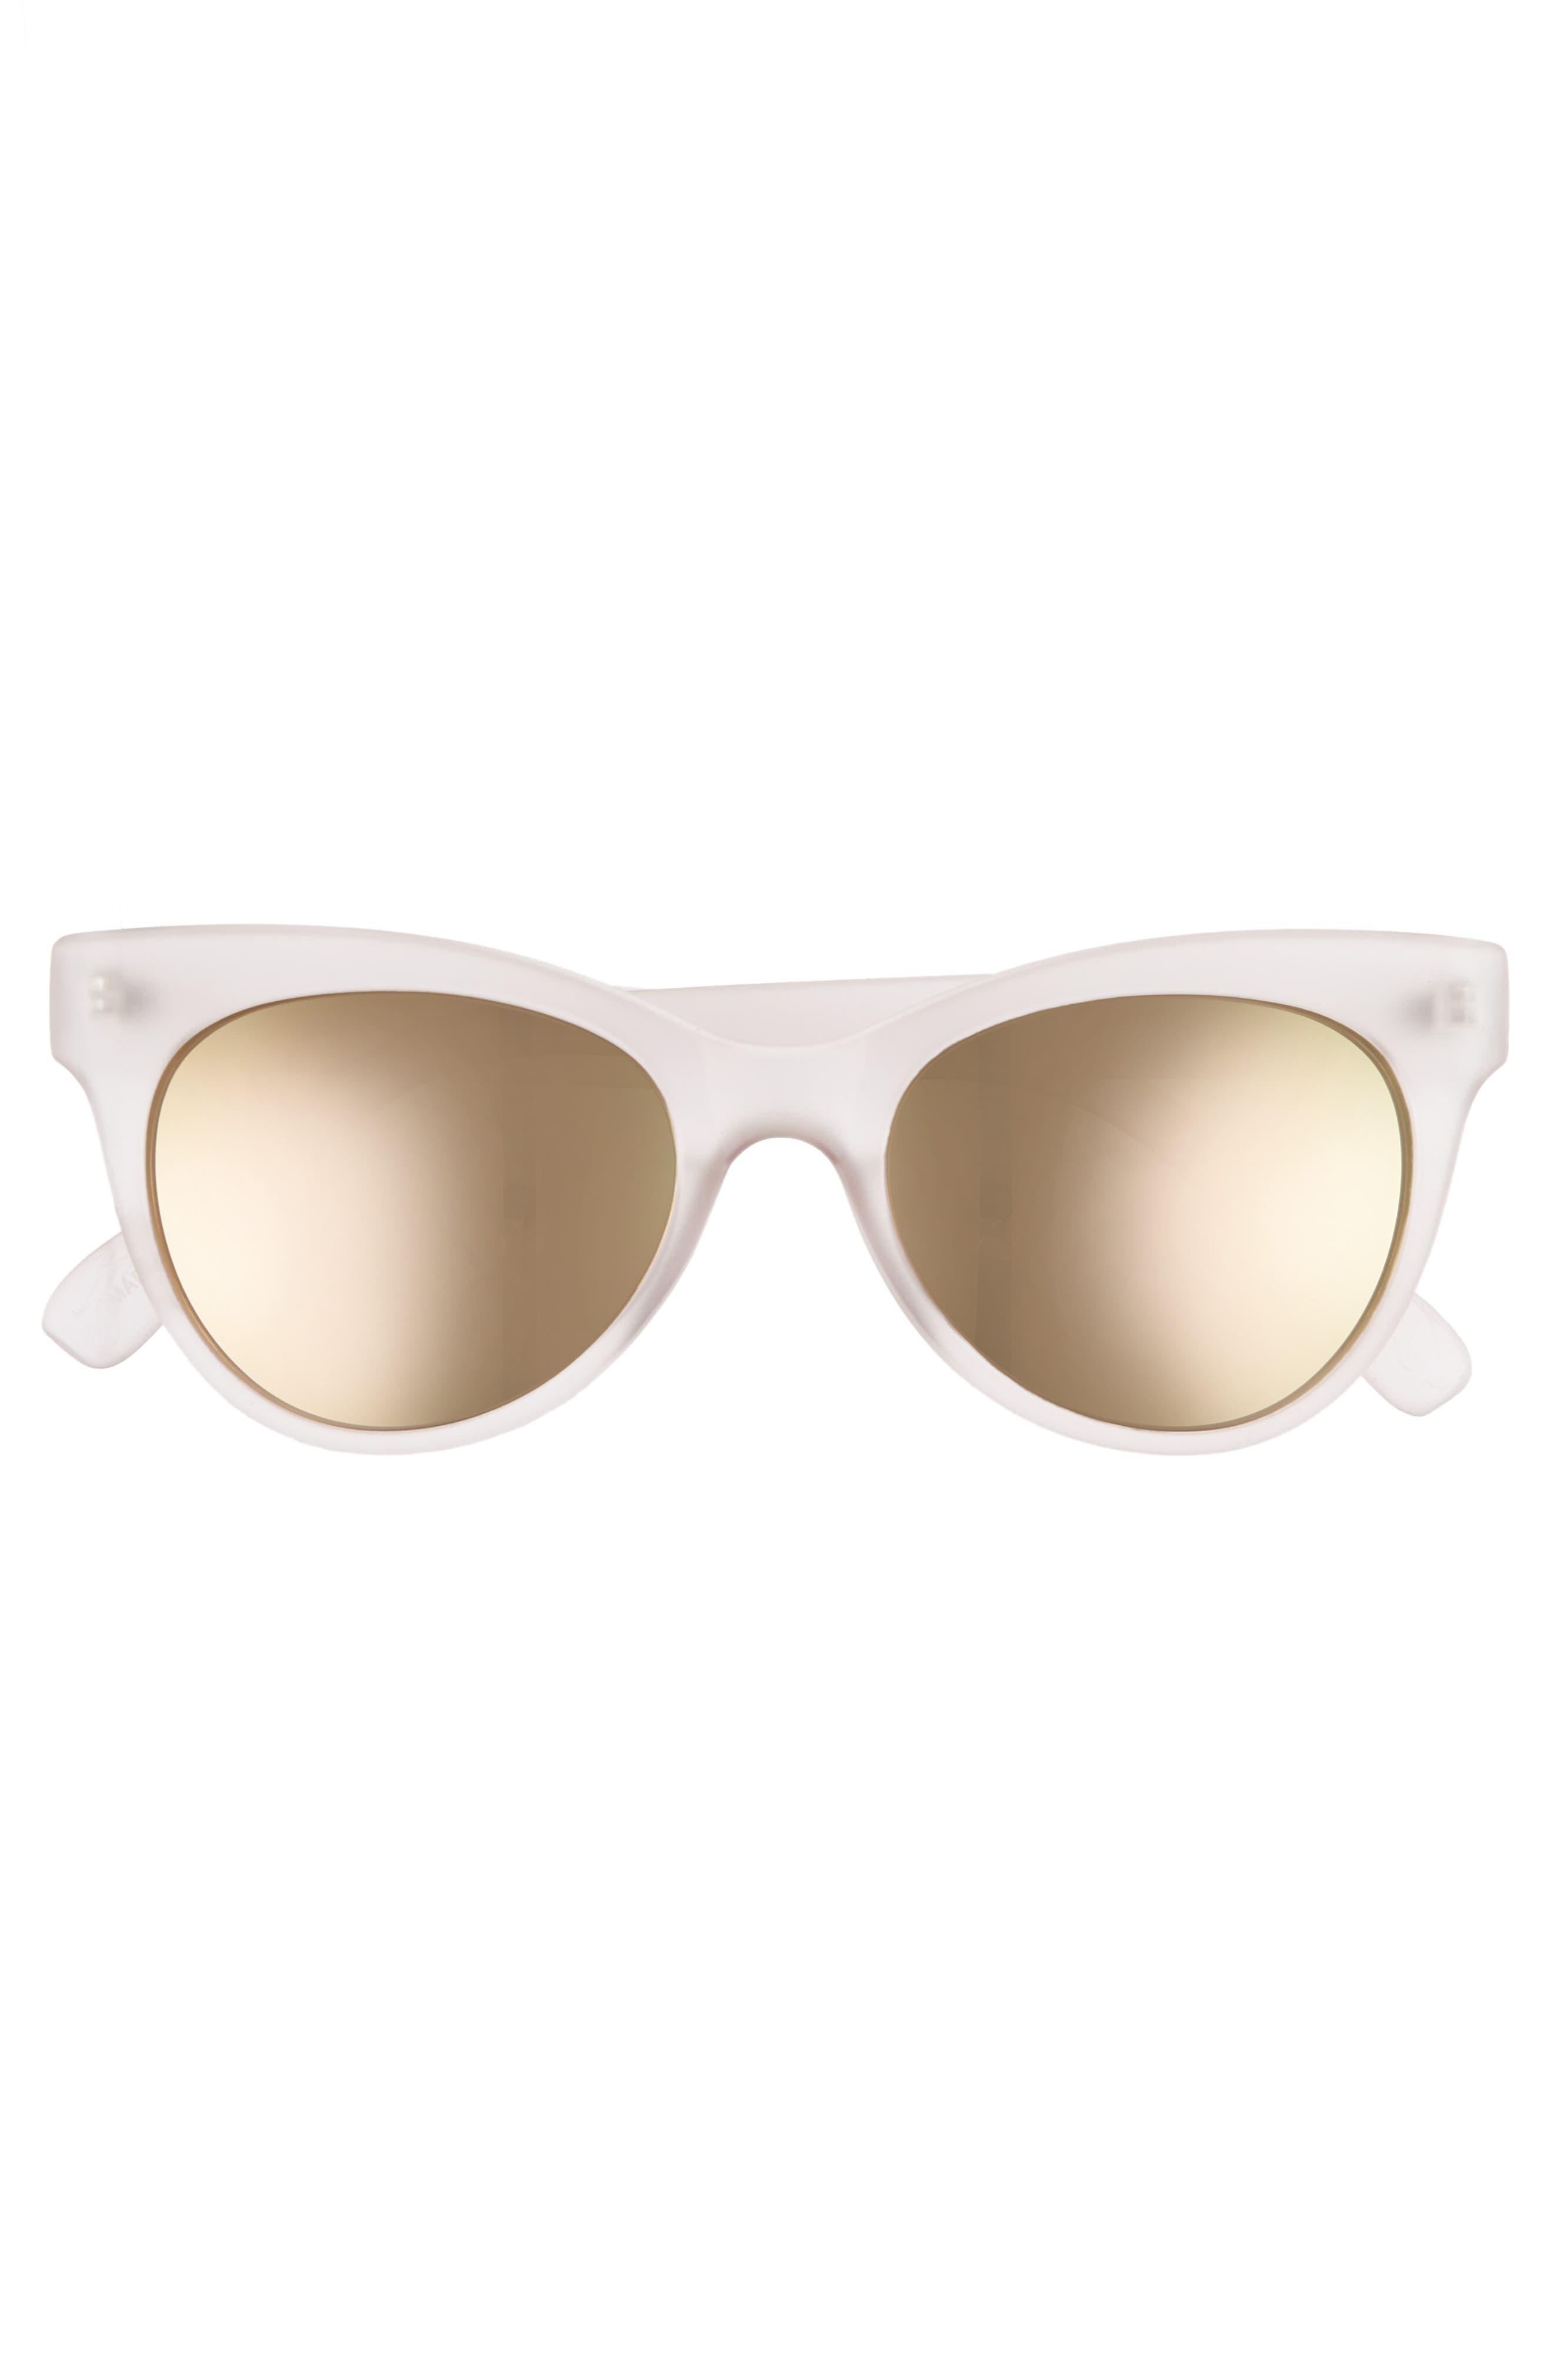 56mm Cat Eye Sunglasses,                             Alternate thumbnail 3, color,                             Milky Pink/ Pink